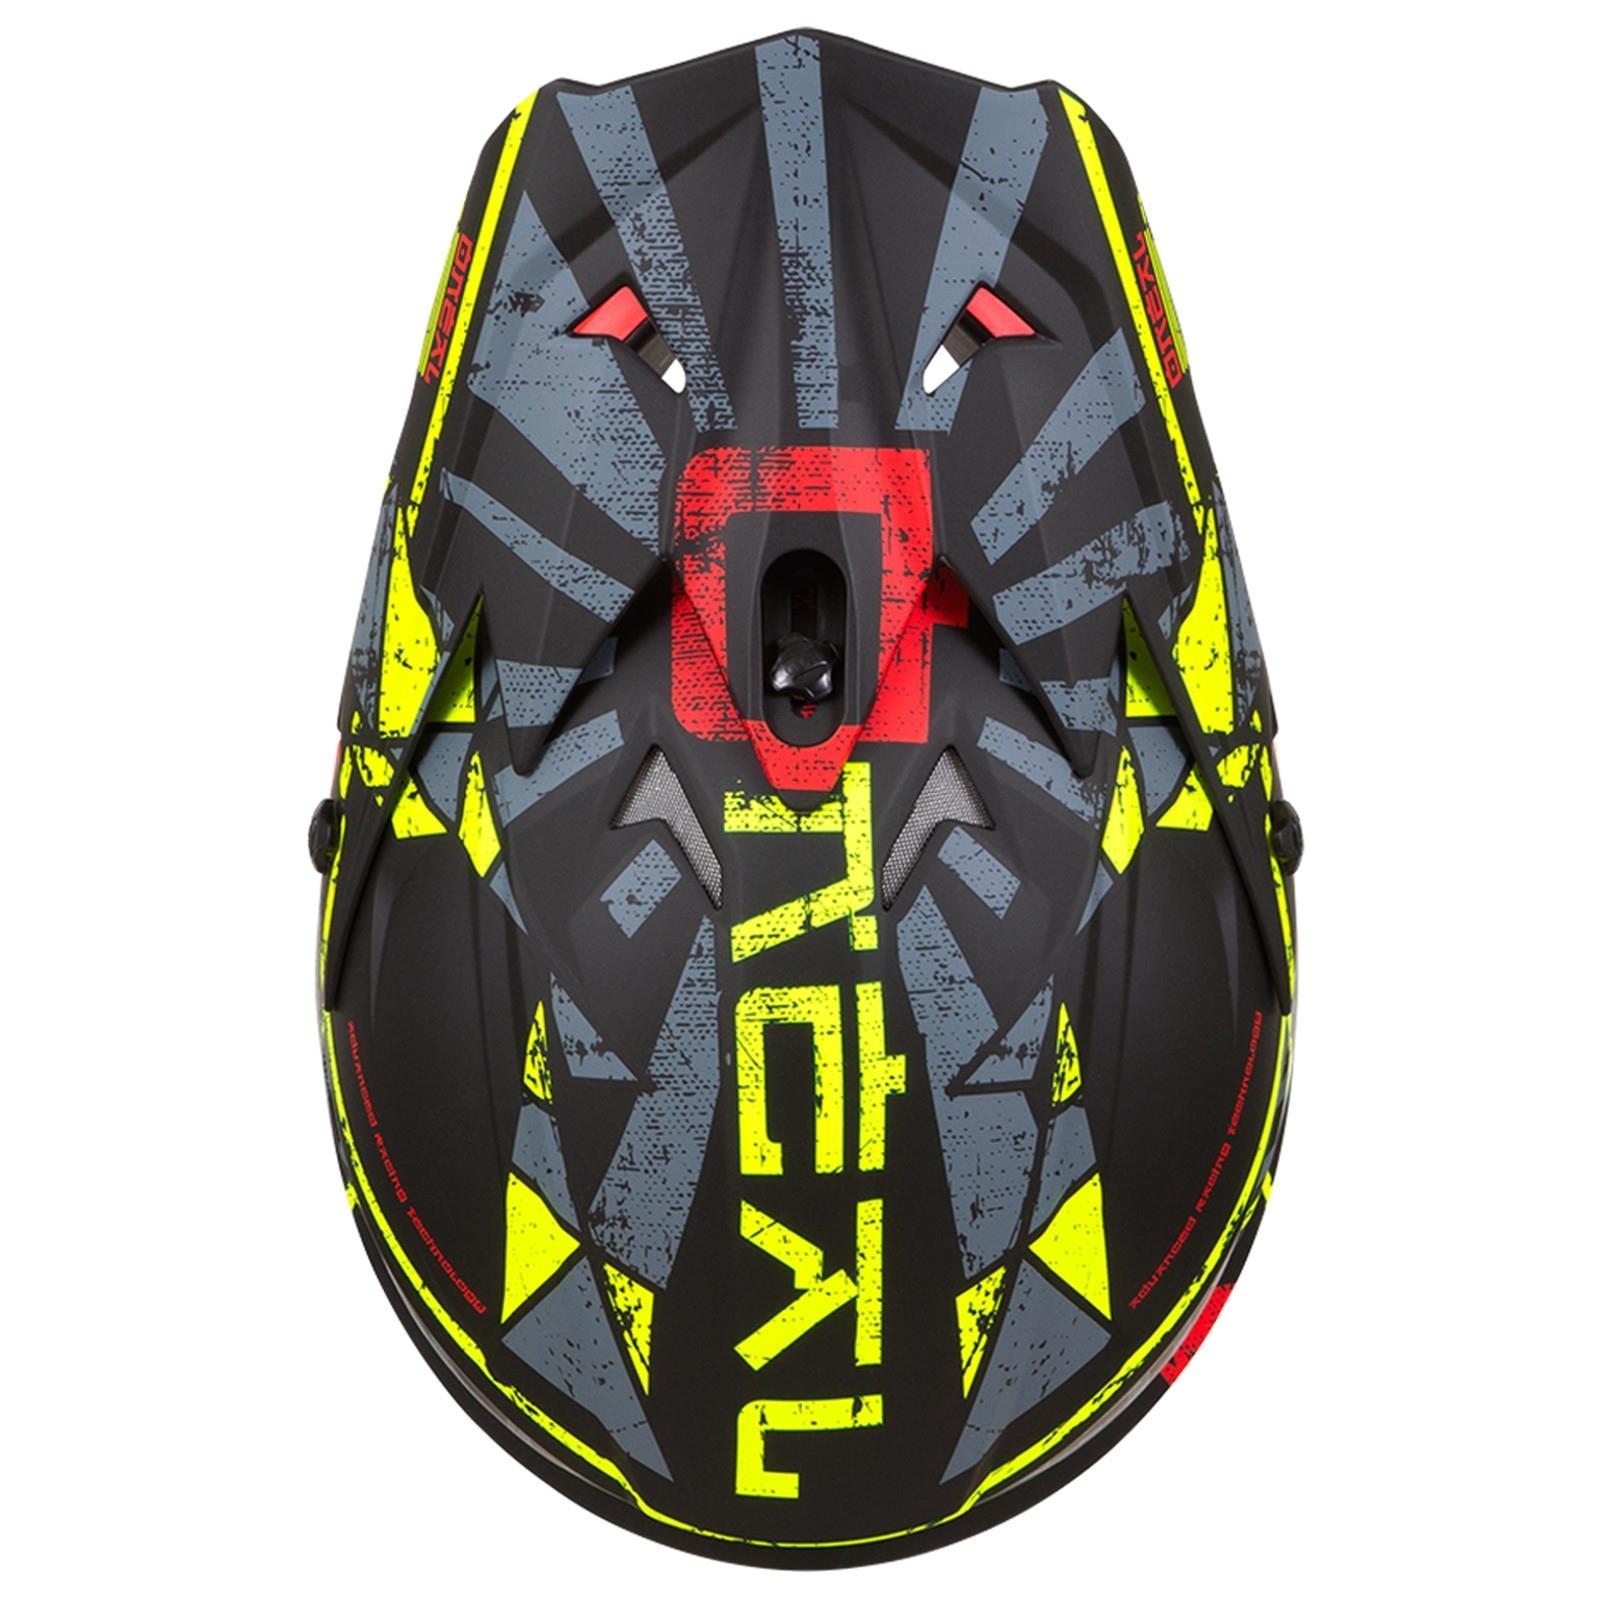 ONeal-Motocross-casco-MX-ENDURO-MOTO-BICI-FUORISTRADA-CROSS-Series-Adventure miniatura 28